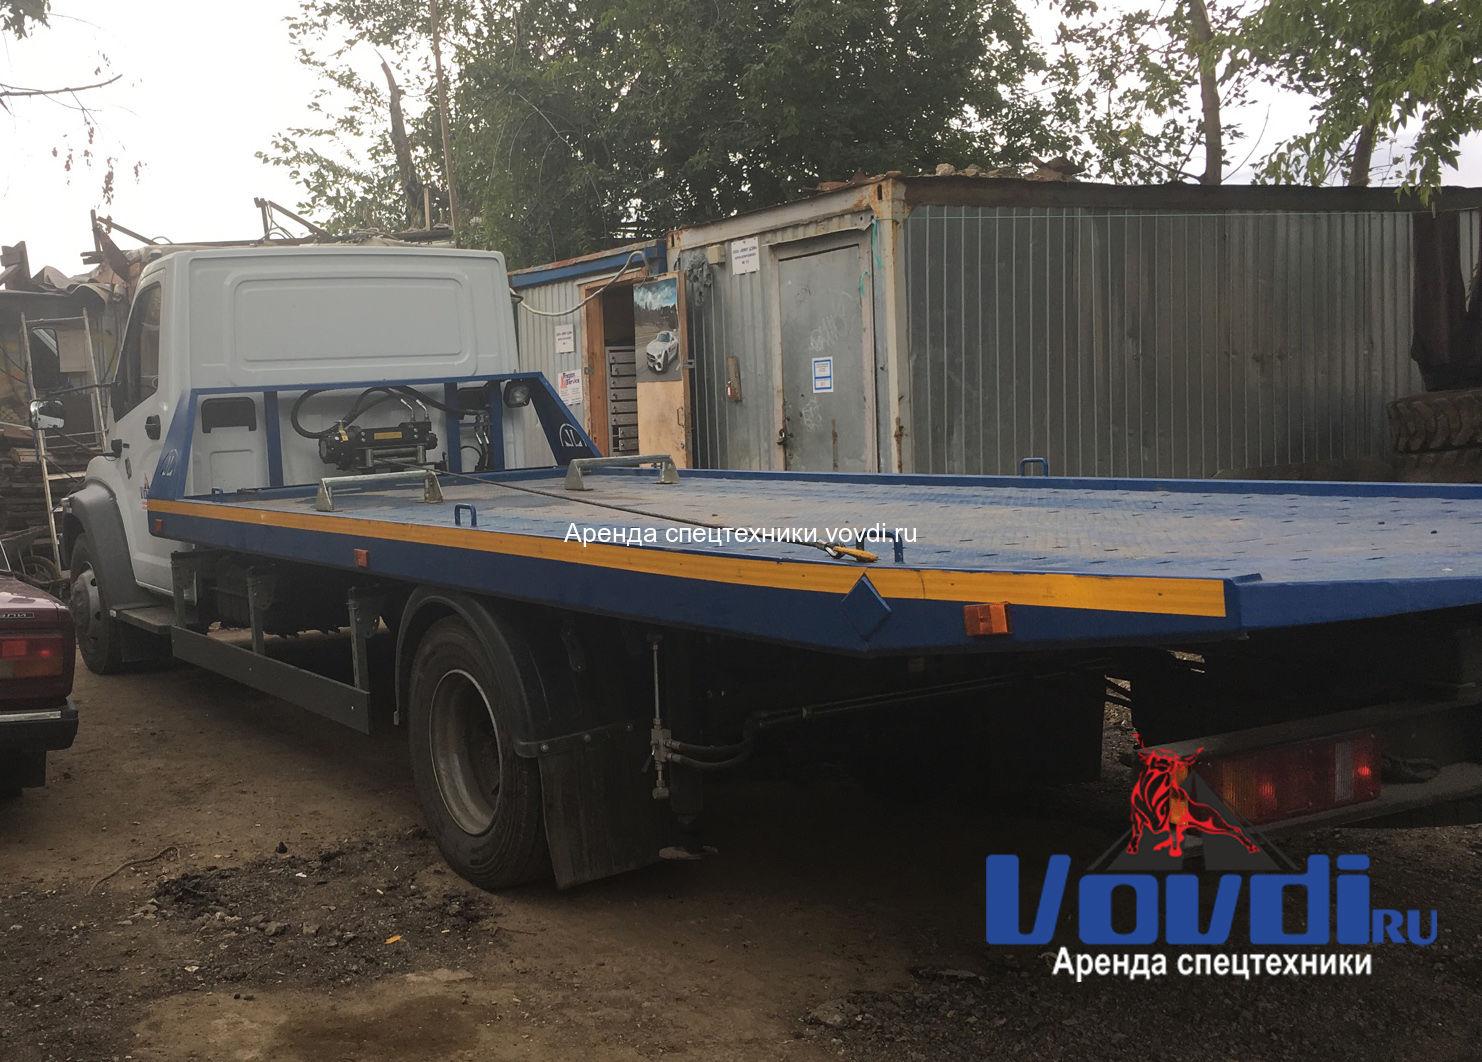 Эвакуатор Газон Некст до 5.2 тонн со сбвижной платформой